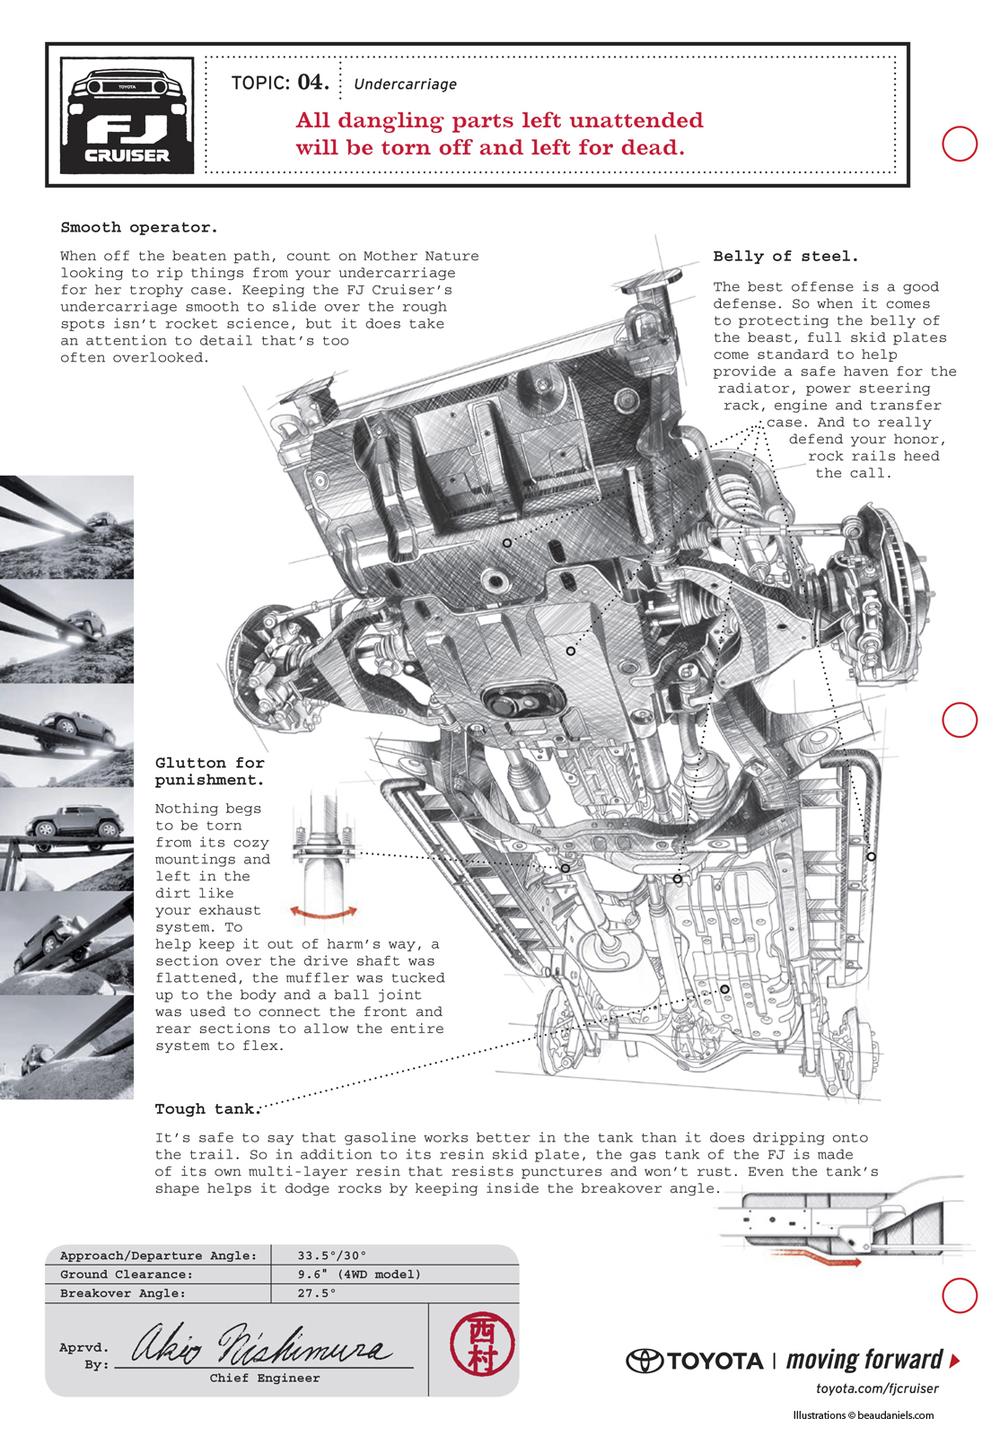 Famous Car Bonnet Diagram Pictures Inspiration - Electrical and ...